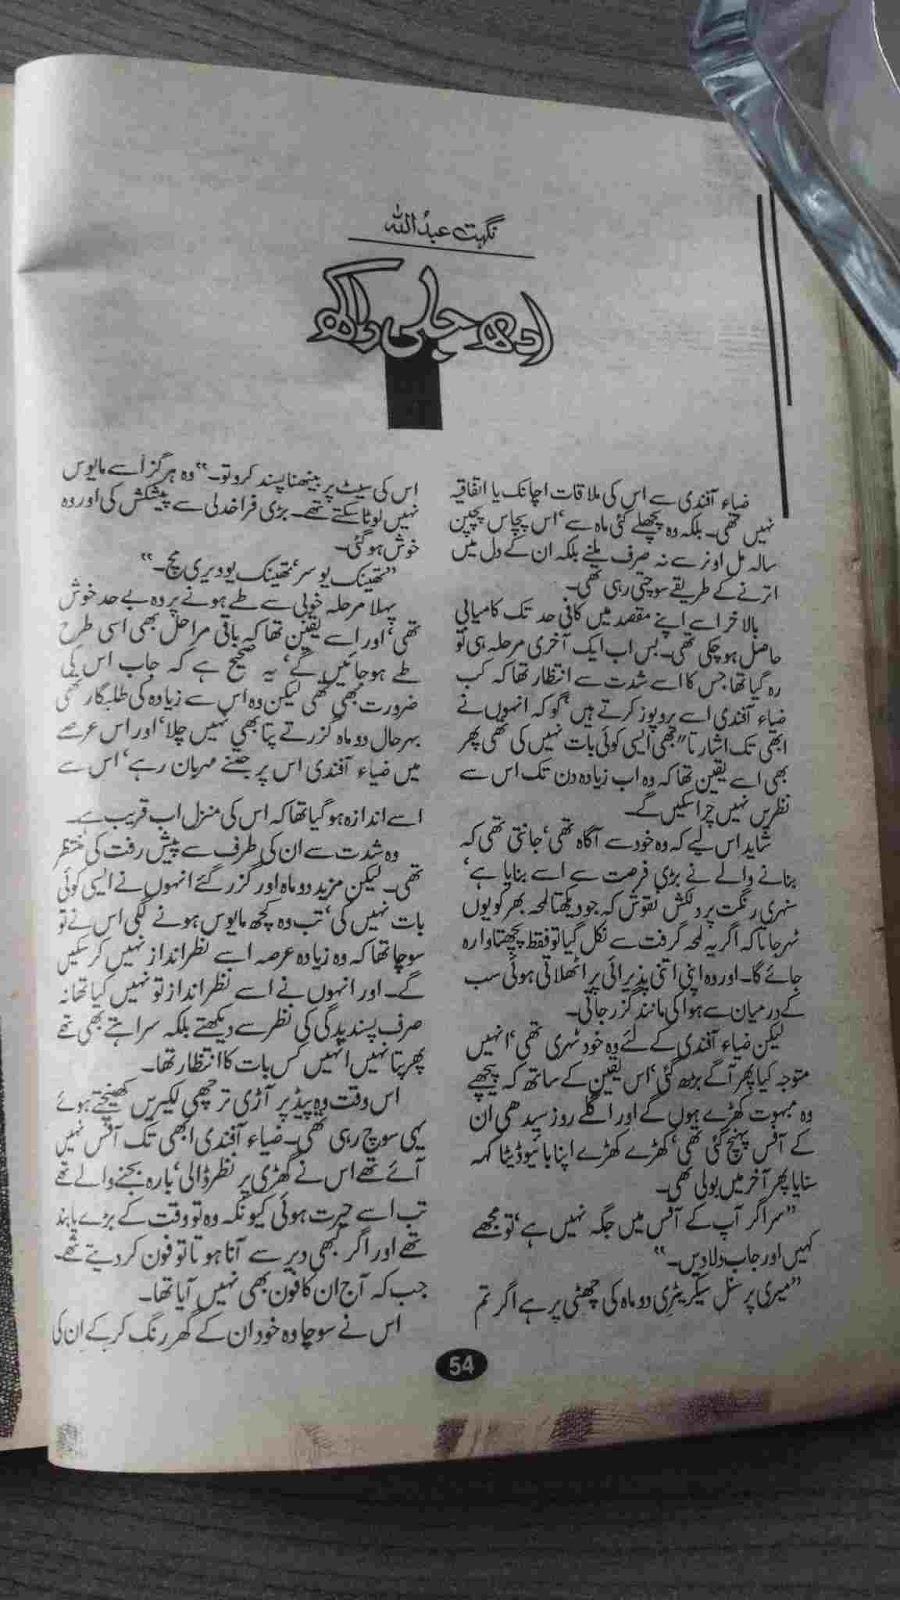 Adh jali raakh novel by Nighat Andullah Online Reading